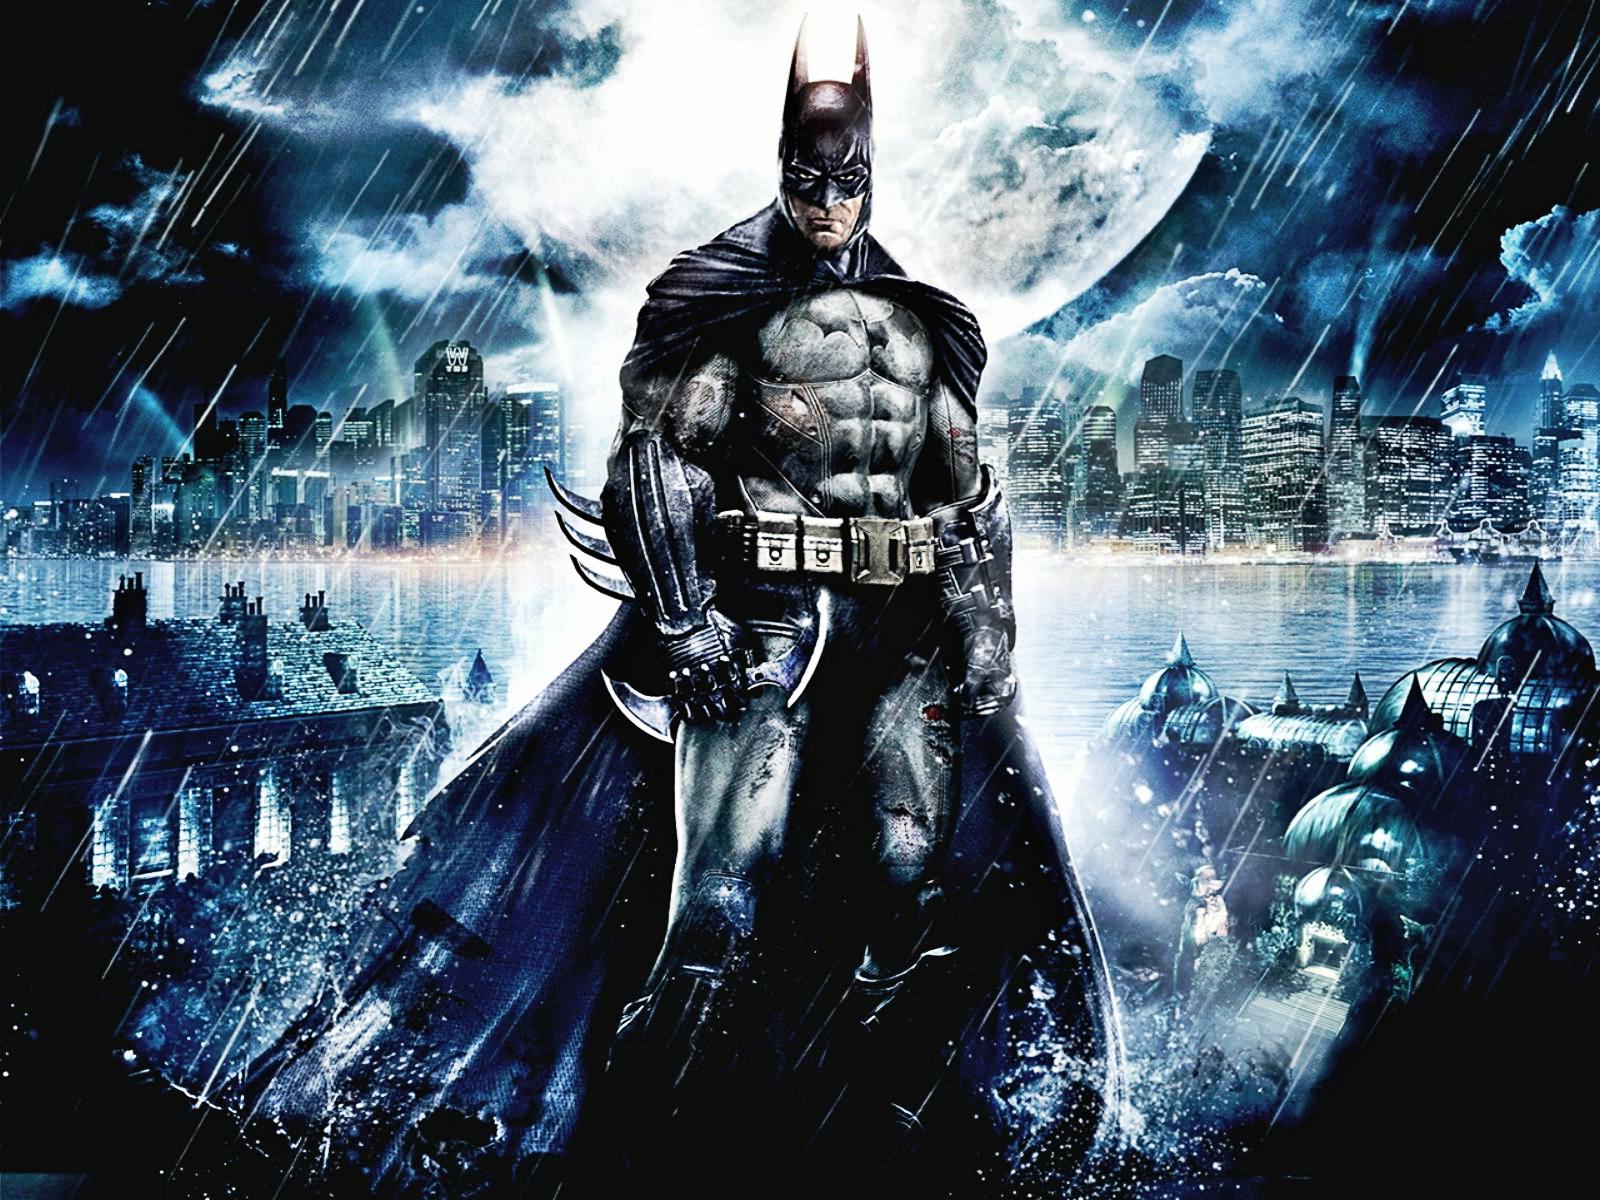 batman wallpapers hd Hd Wallpapers 1600x1200